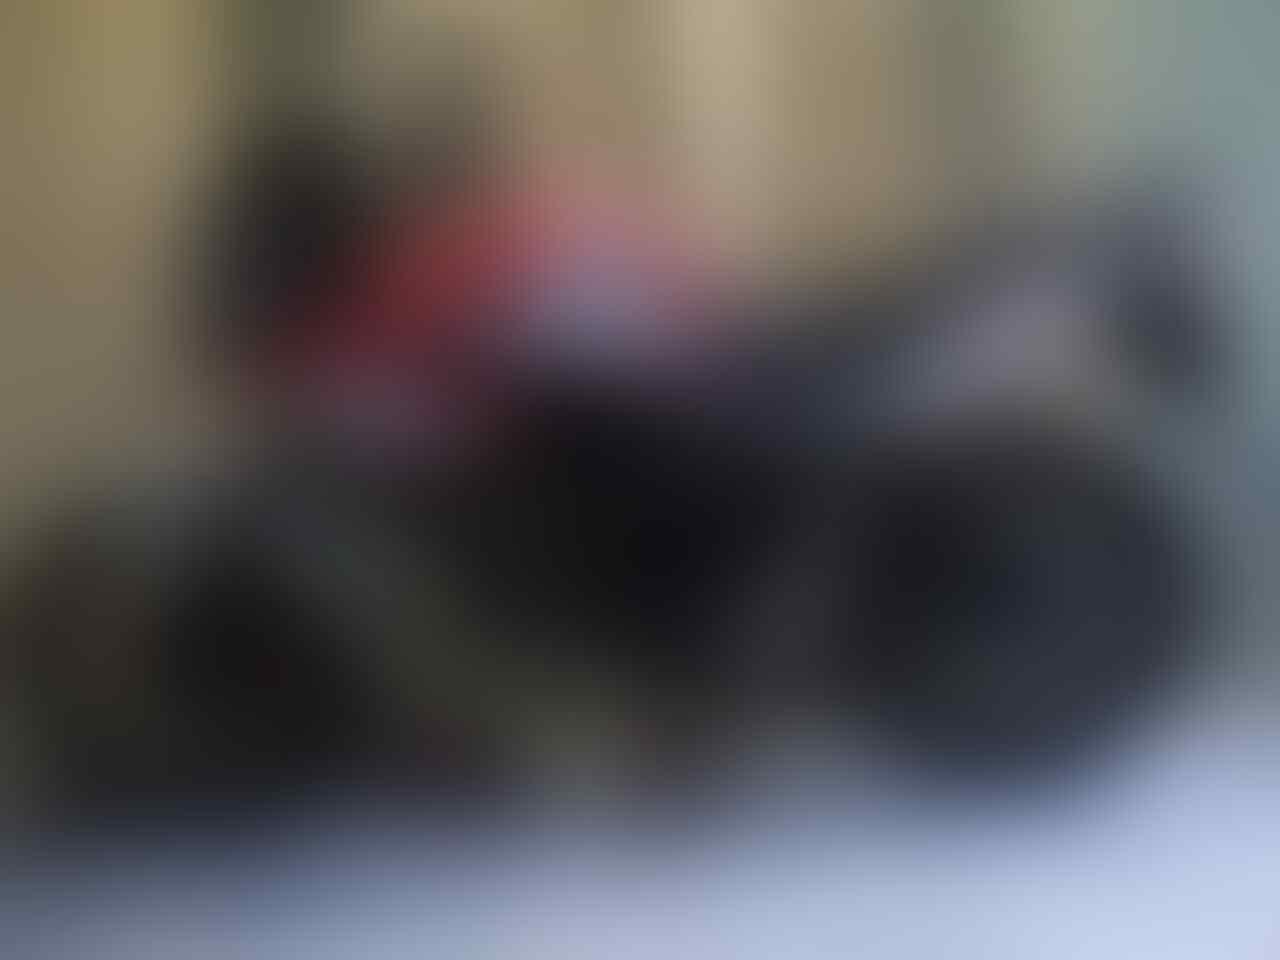 [HOSTICUS] Honda CB150R Streetfire Community on Kaskus